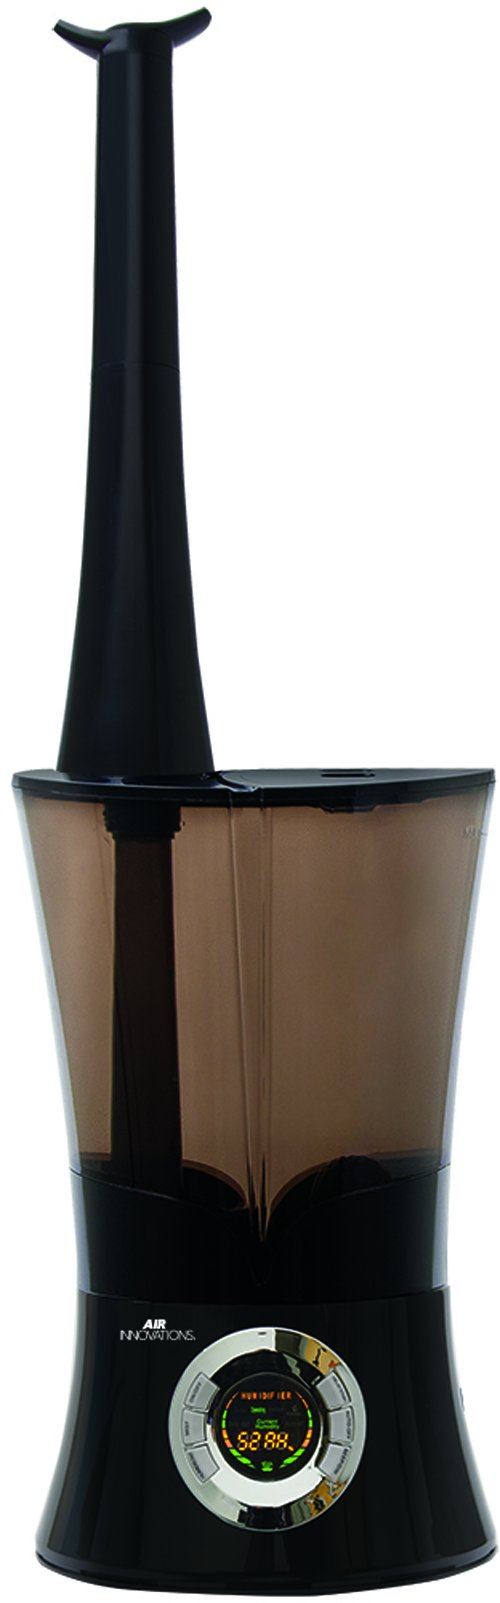 Air Innovations 1.6 Gal. Cool Mist Top Fill Digital Ultrasonic Humidifier -Black